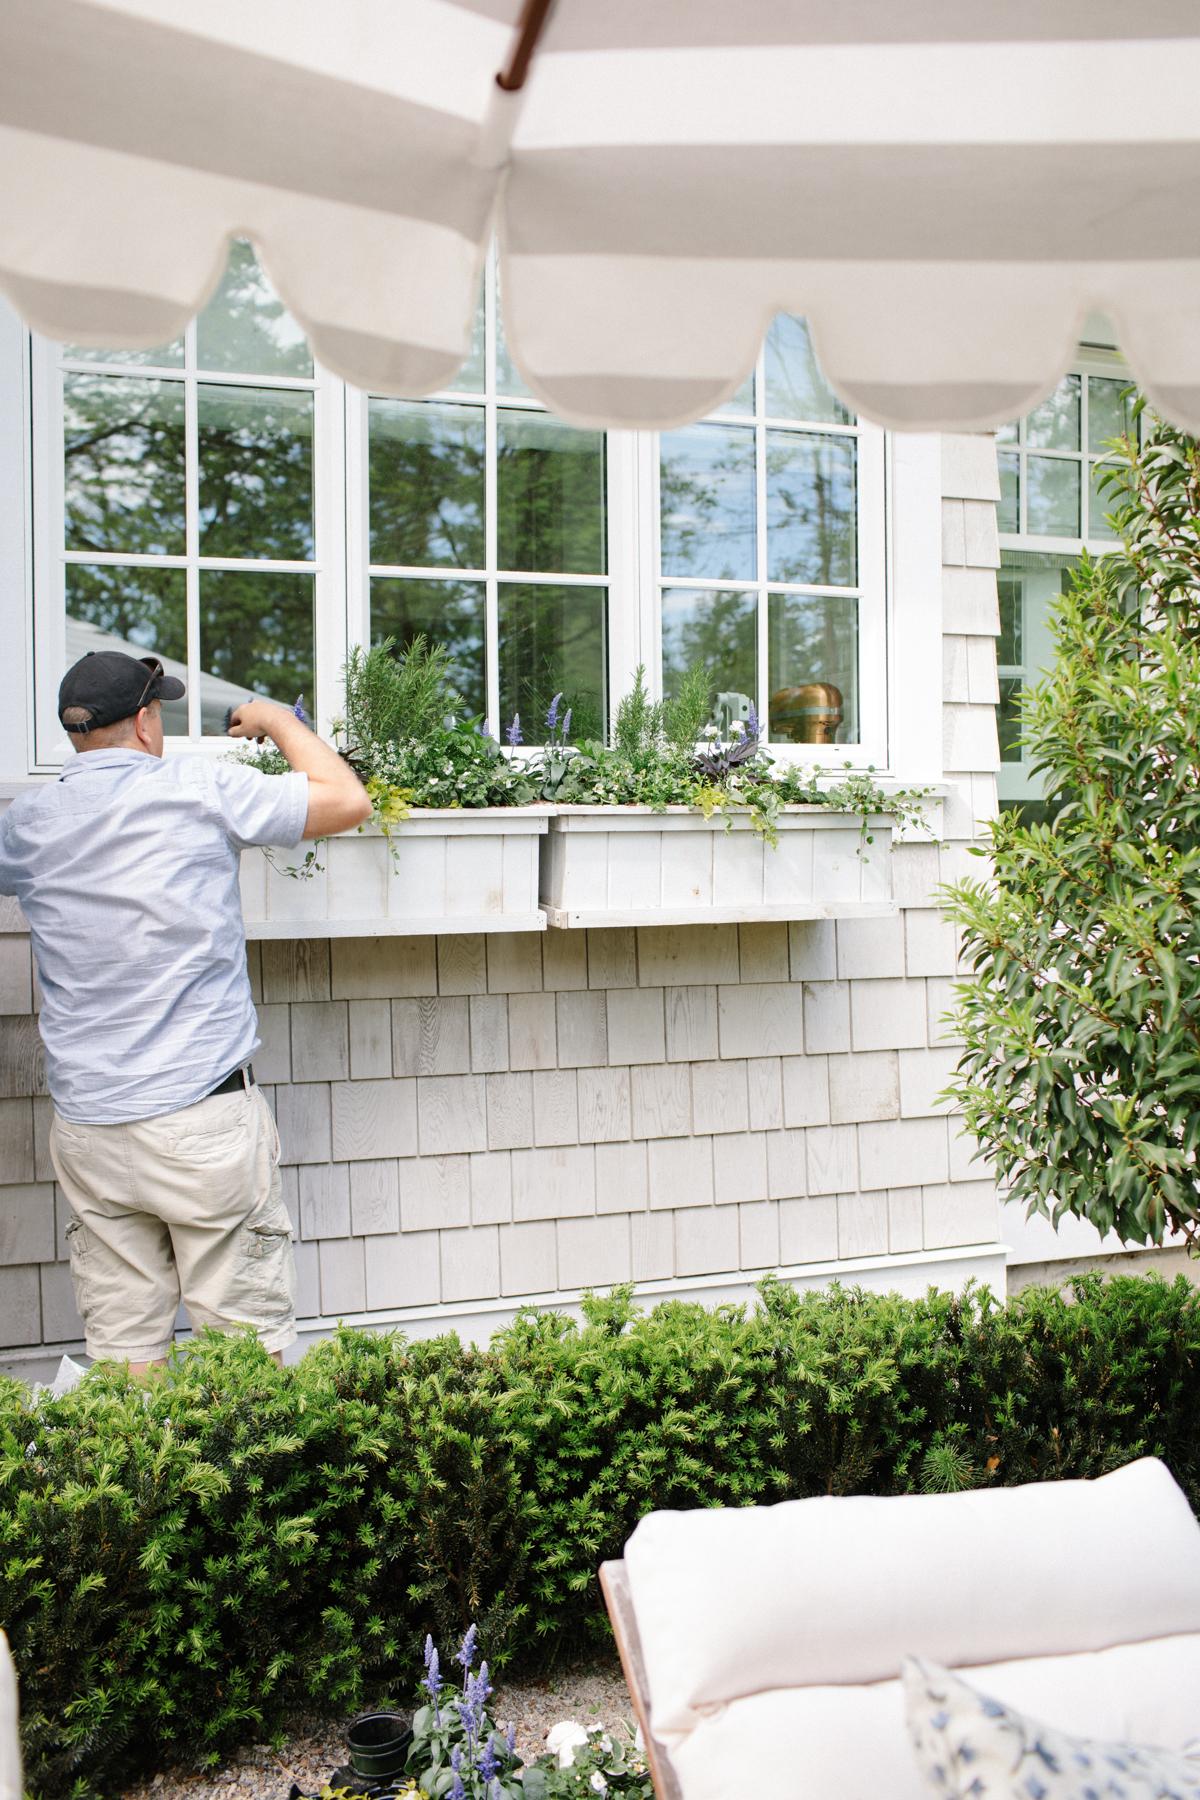 How to plant a garden planter